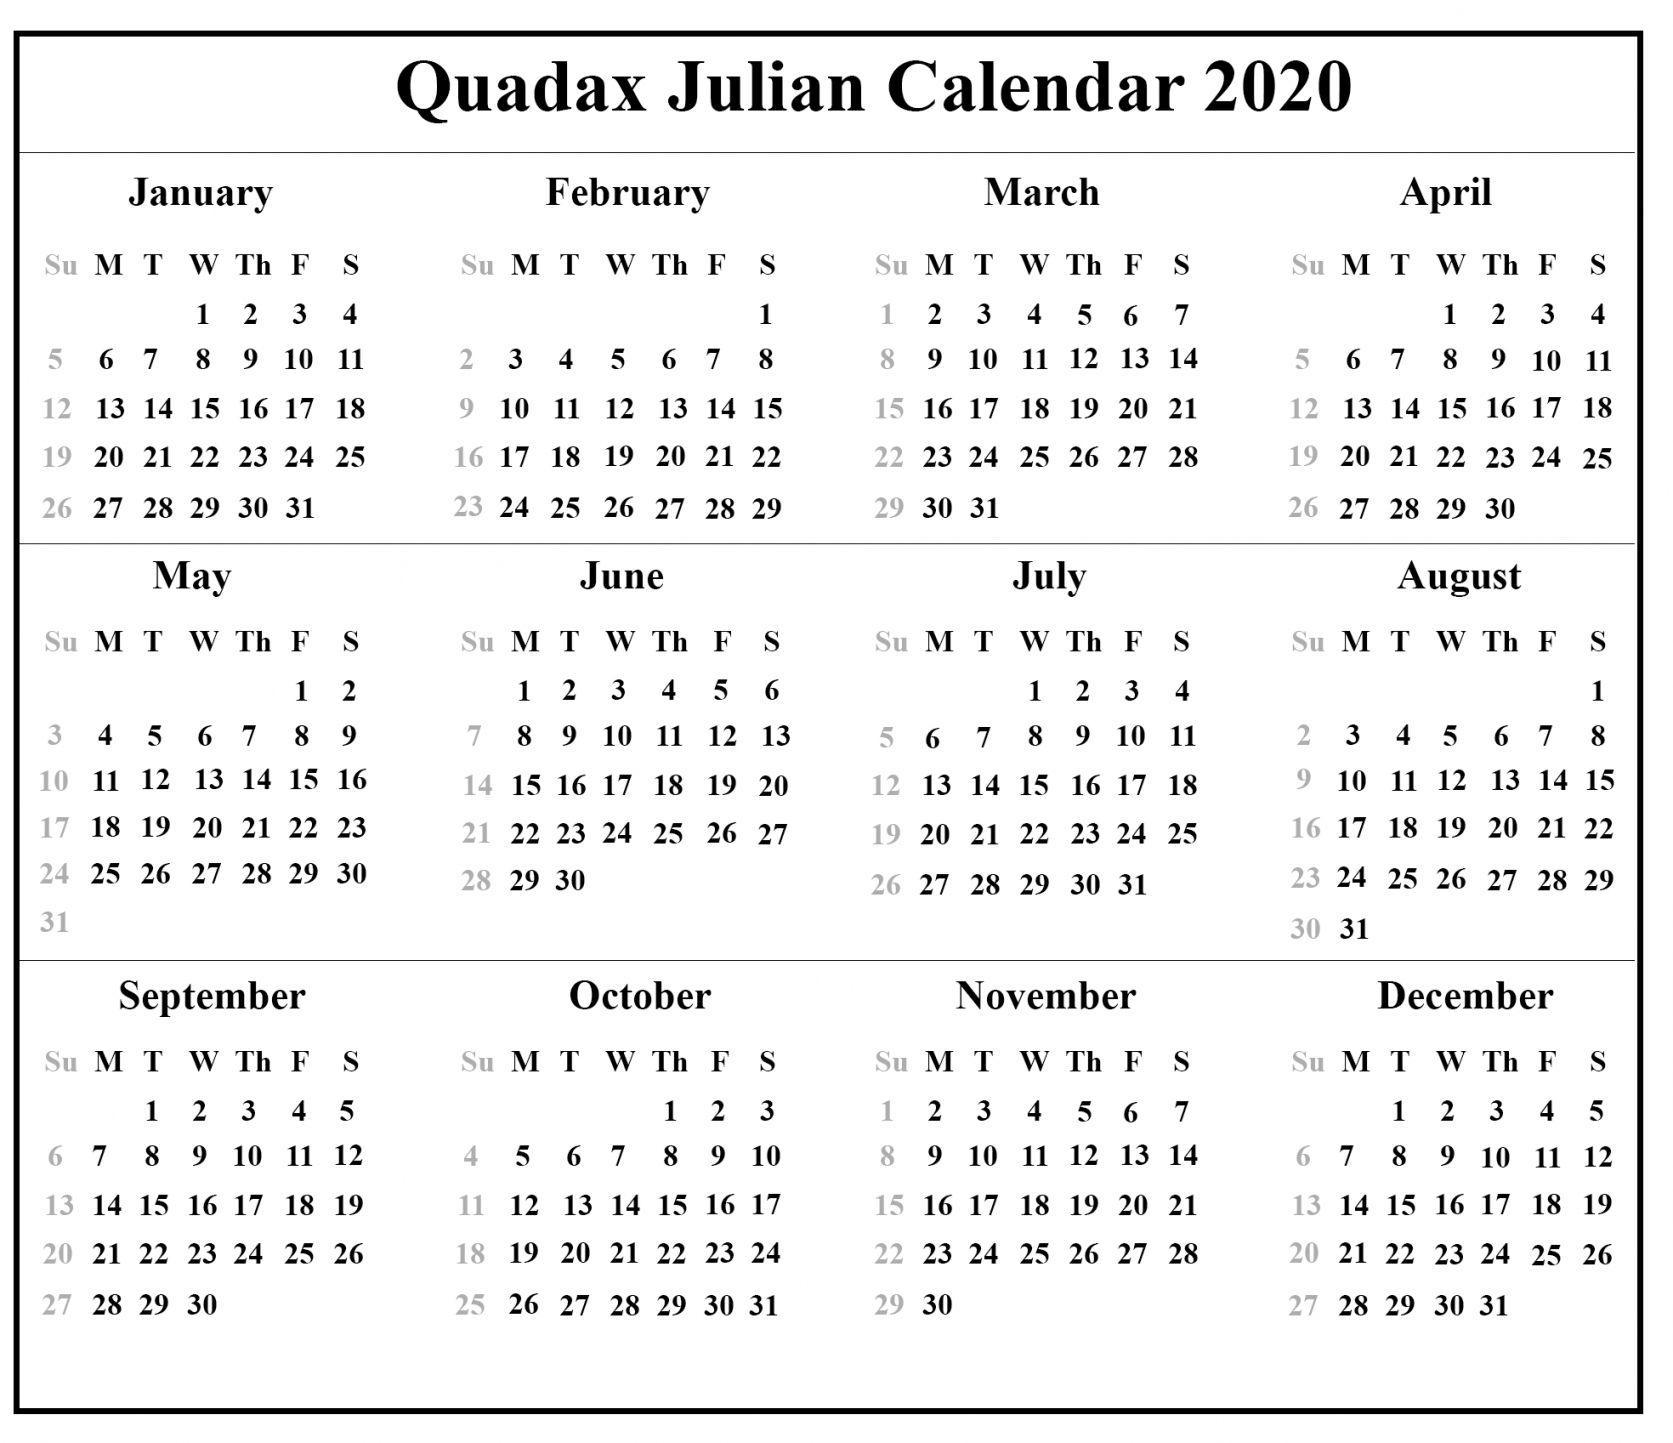 Julian Date Calendar 2021 | Calendar 2020 Template regarding Julian Date Conversion 2021